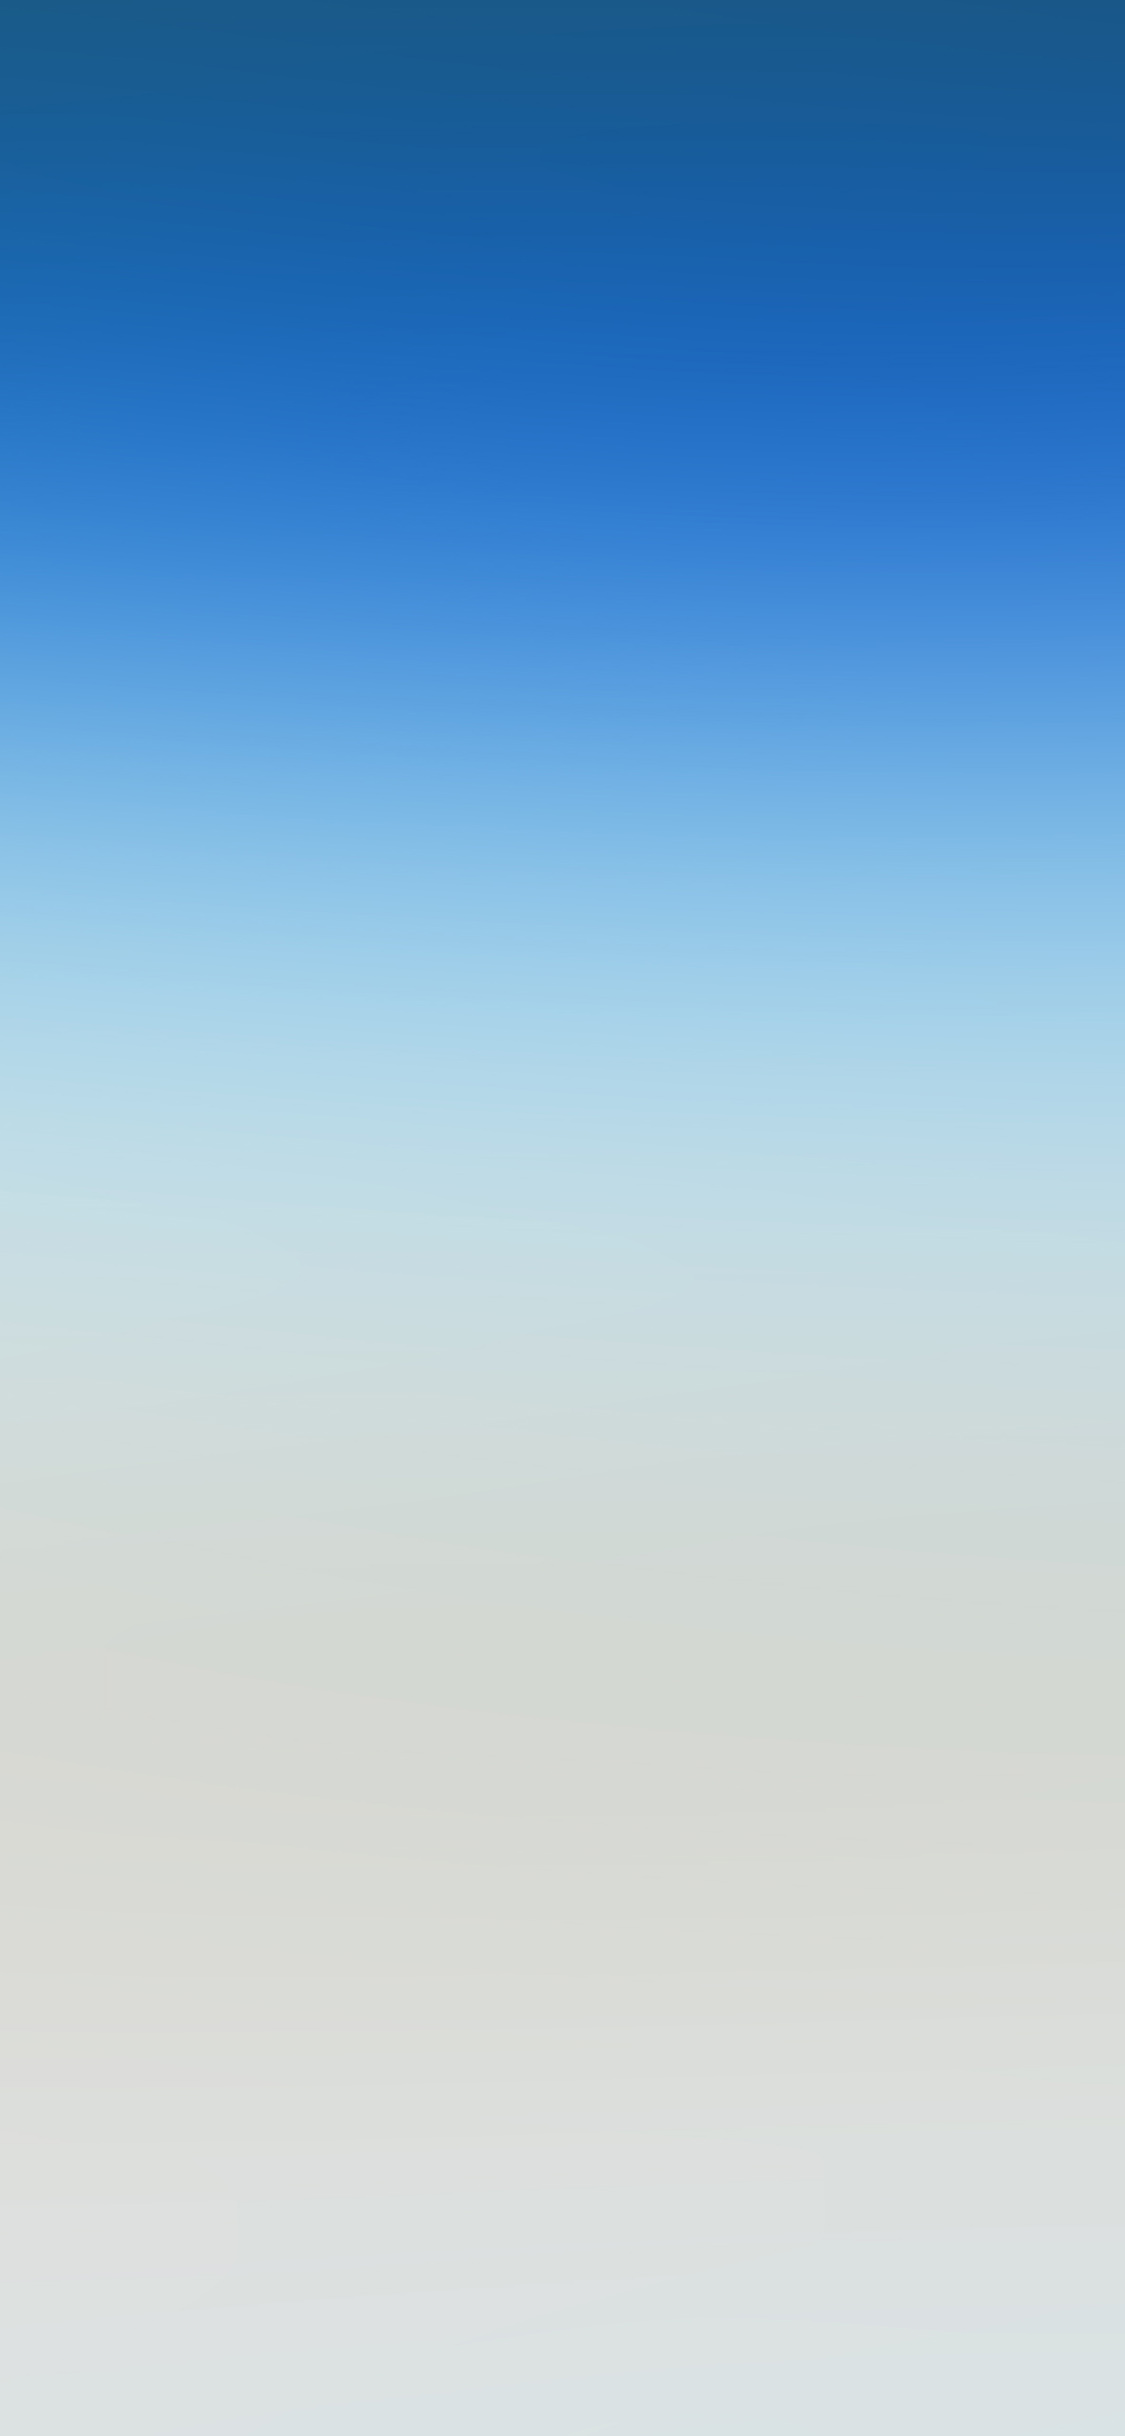 Sj57 Sky Blue Clear White Gradation Blur Wallpaper